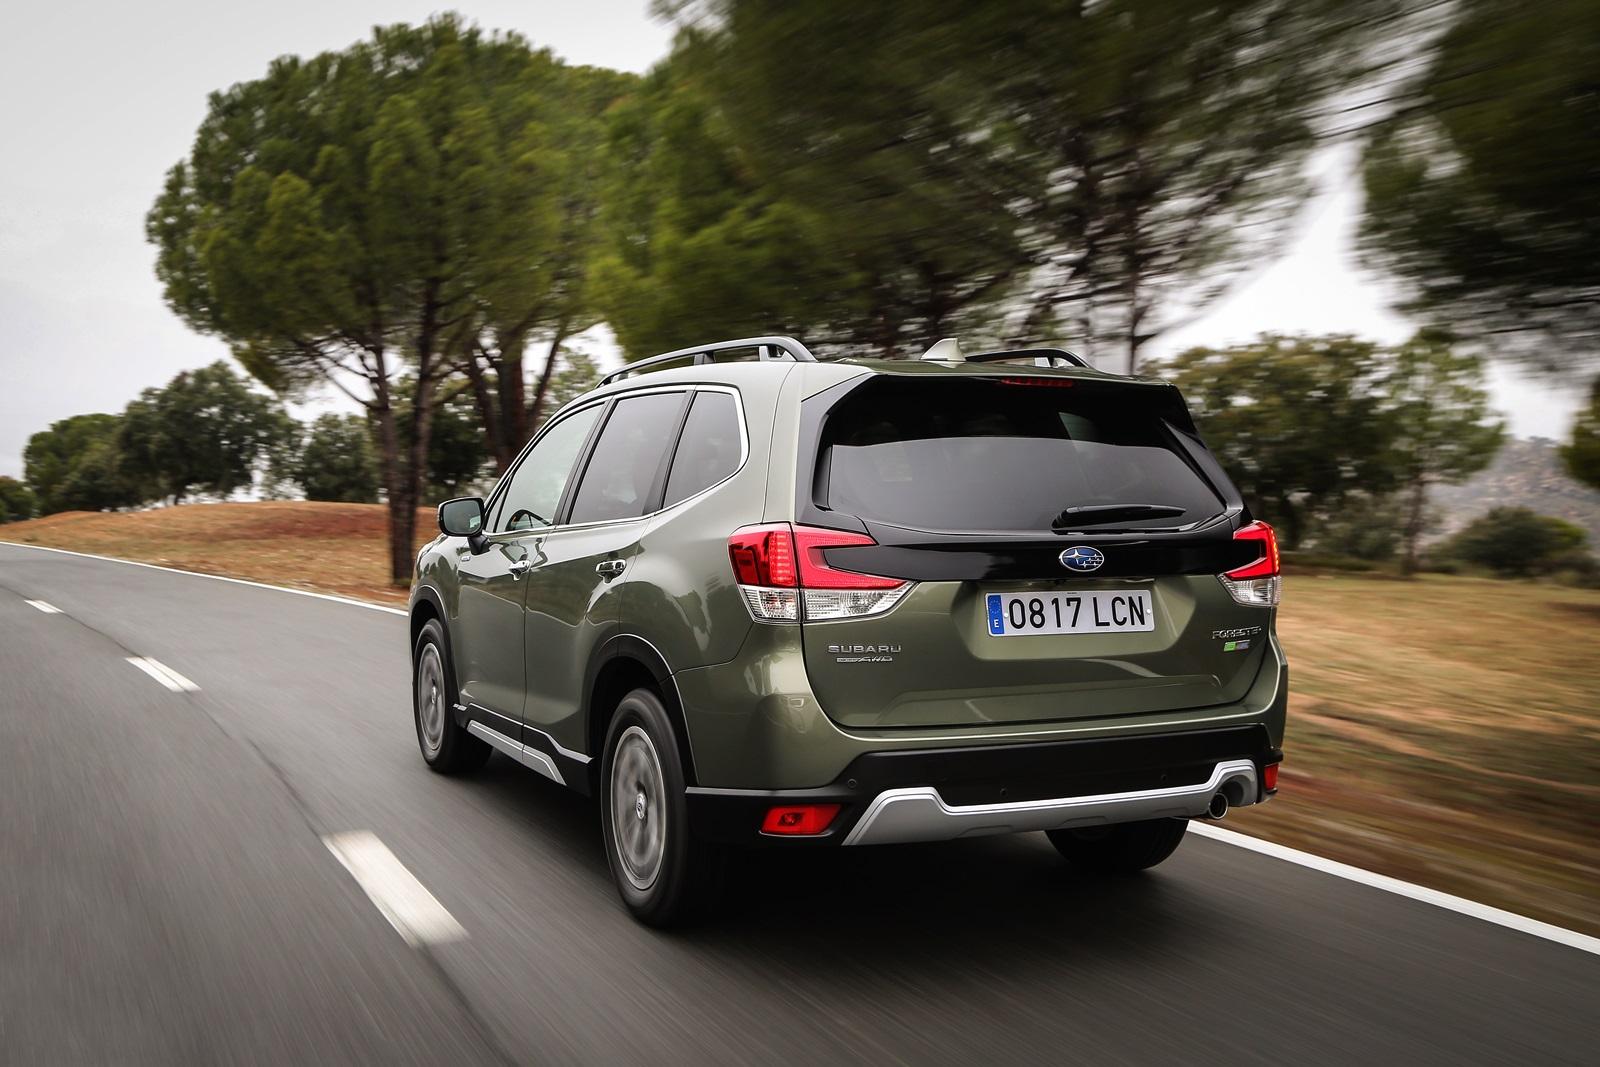 Prueba Subaru Forester Eco Hybrid (9)